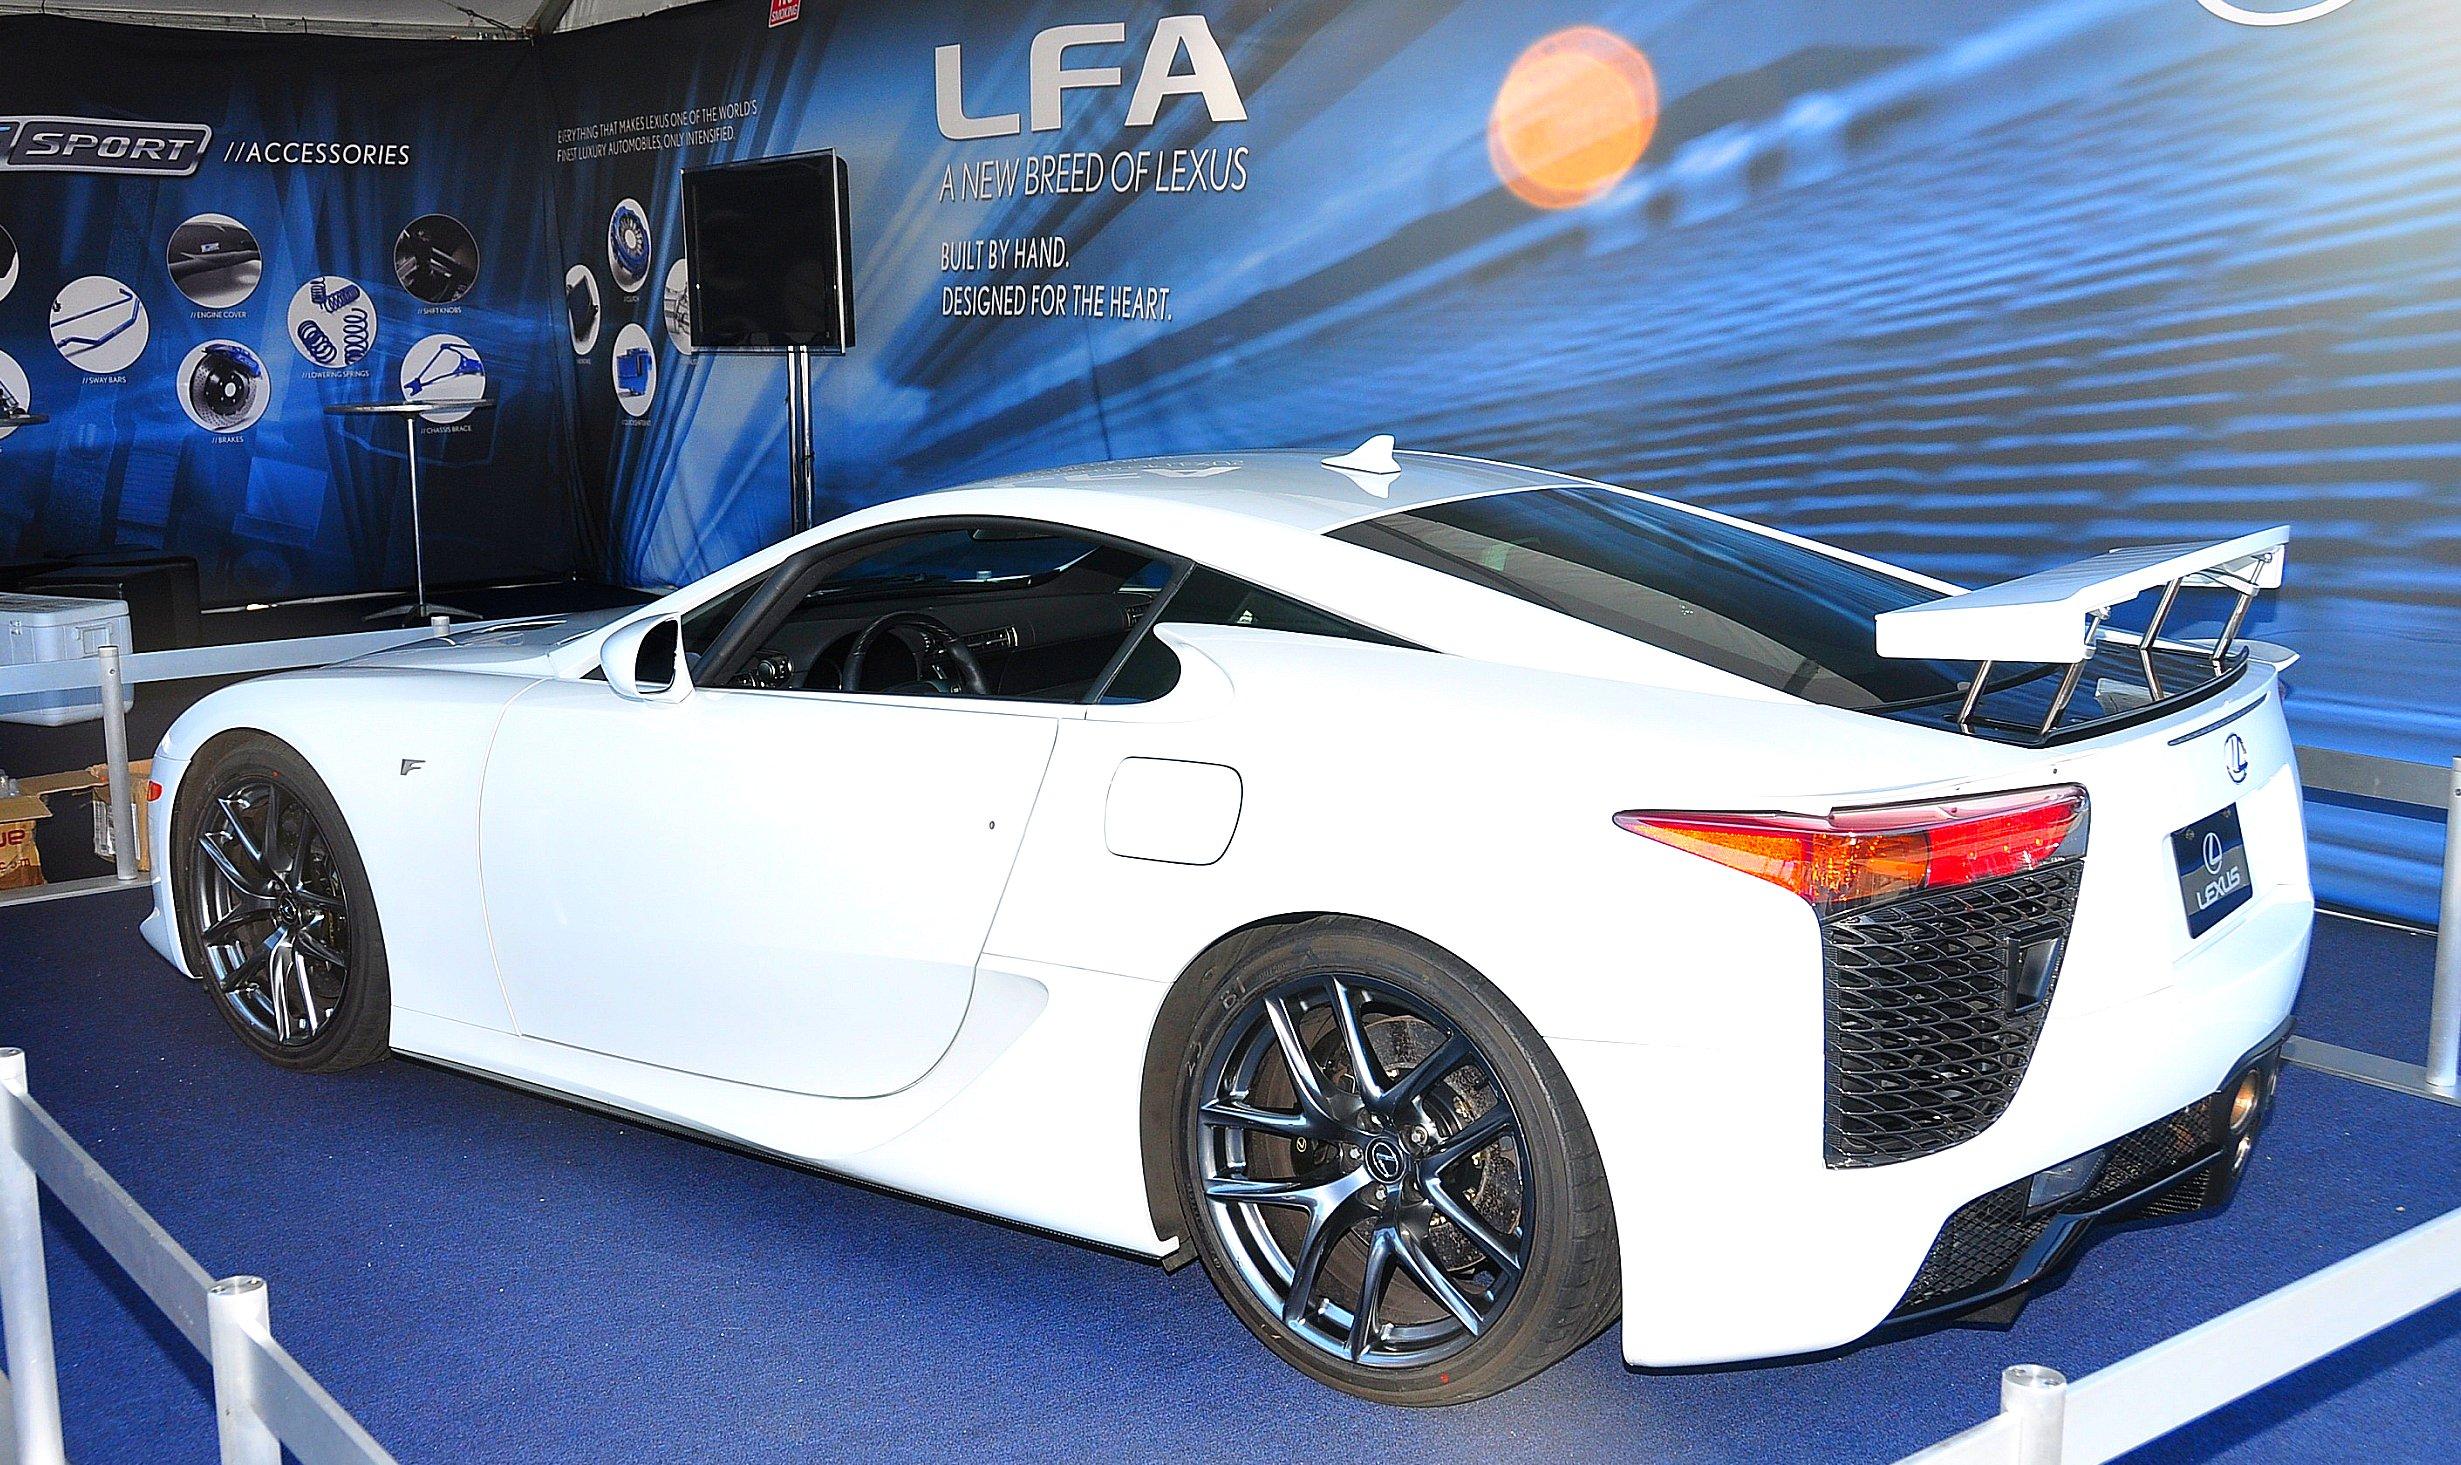 File Lexus Lfa Long Beach Toyotafest Jpg